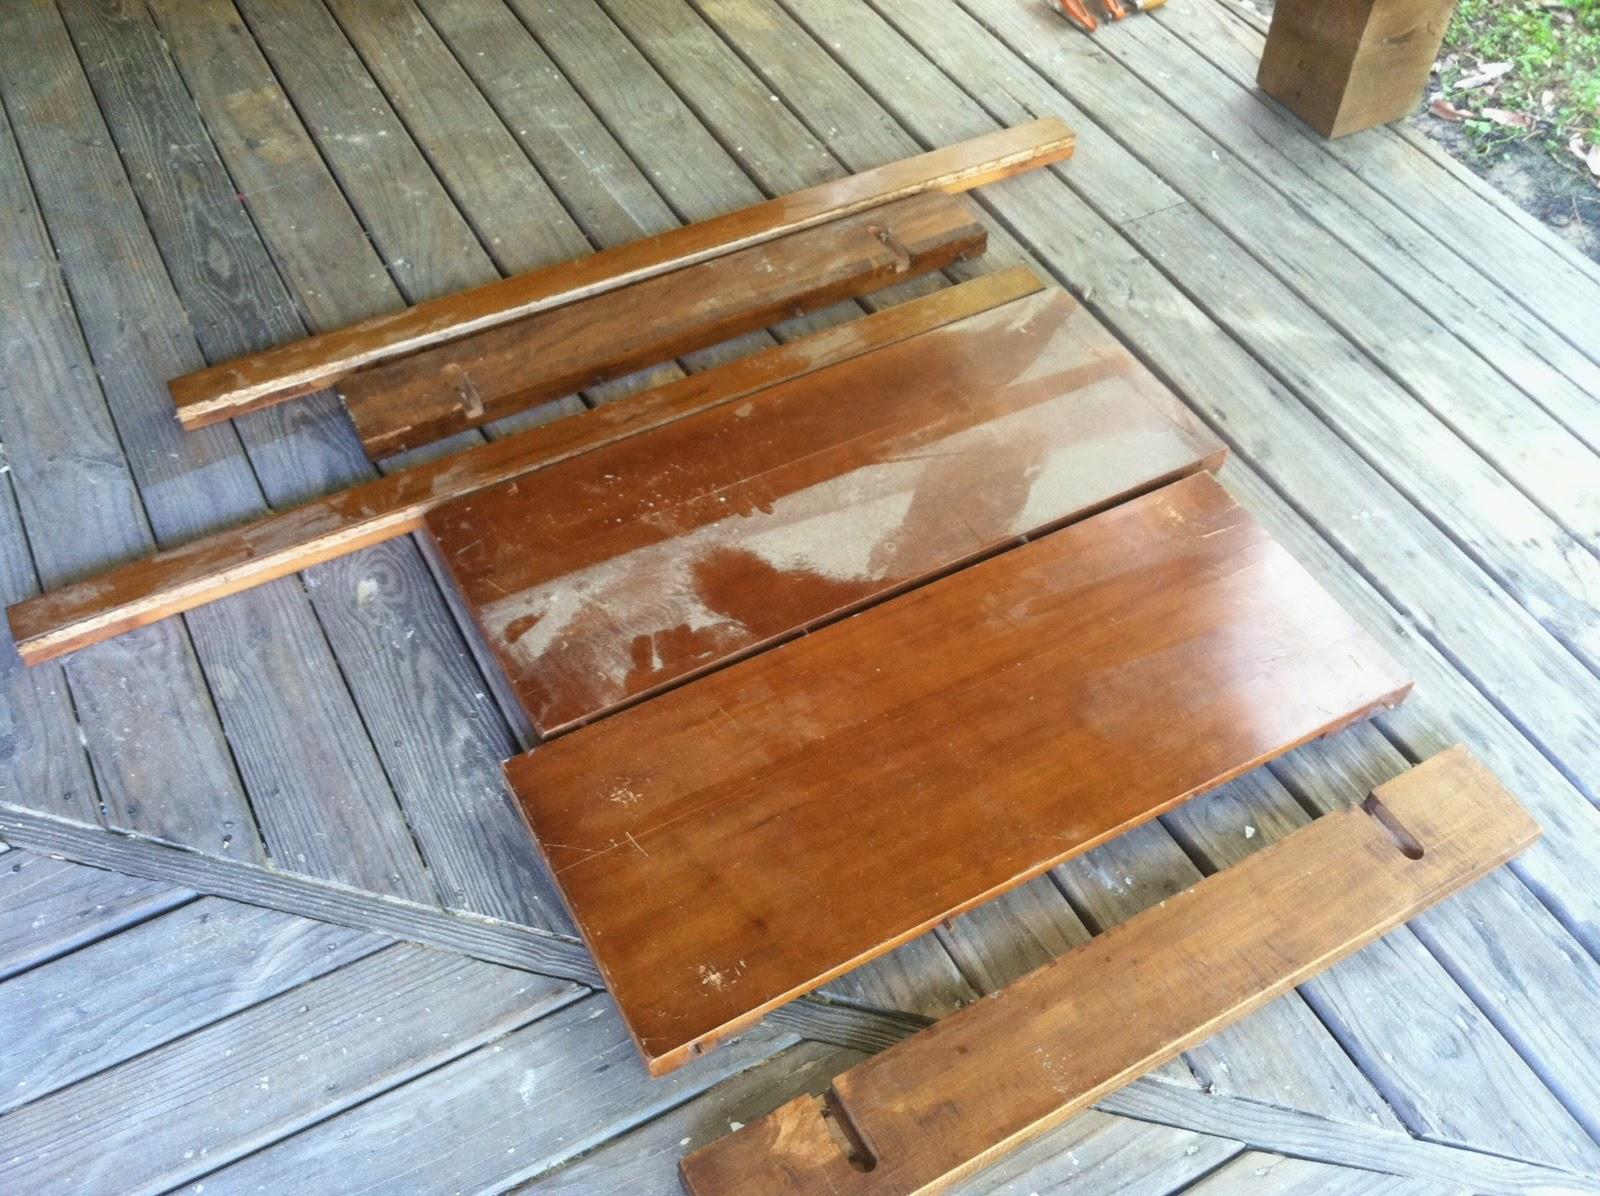 Bon Southern Charm Repurposed Heirloom Wood End Table